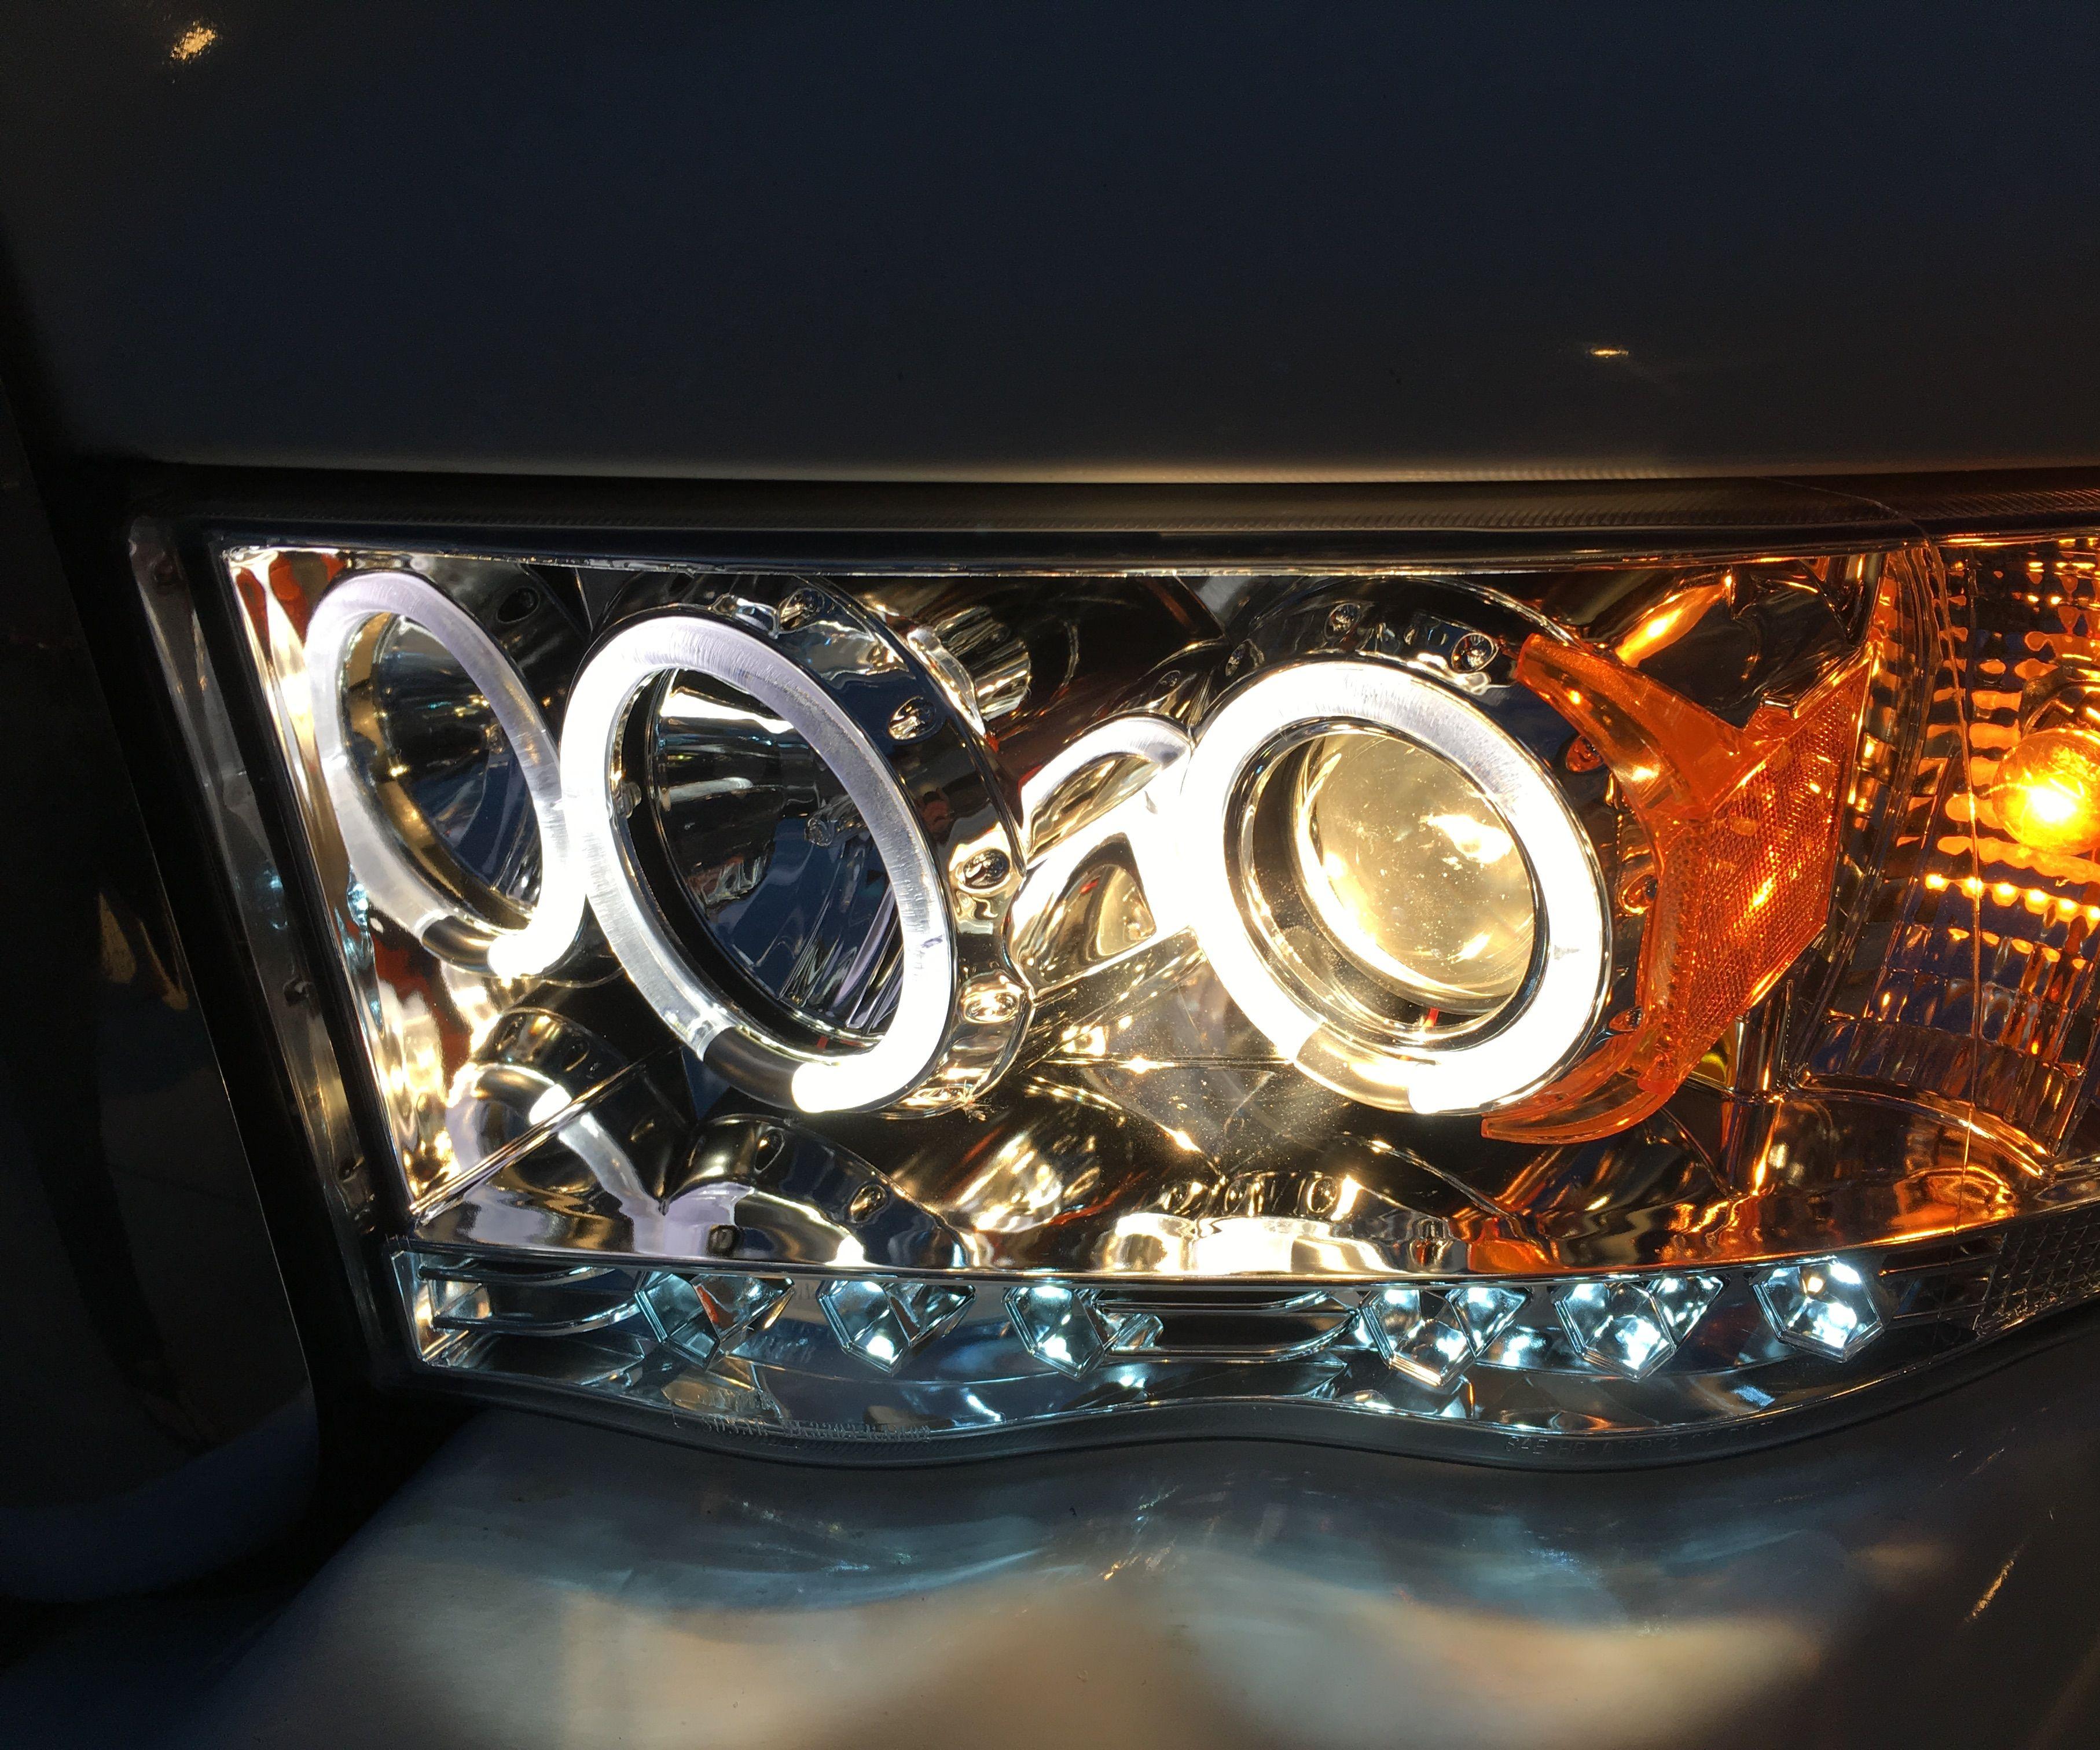 Installing Halo Headlights on a 2004 Dodge Ram Pickup